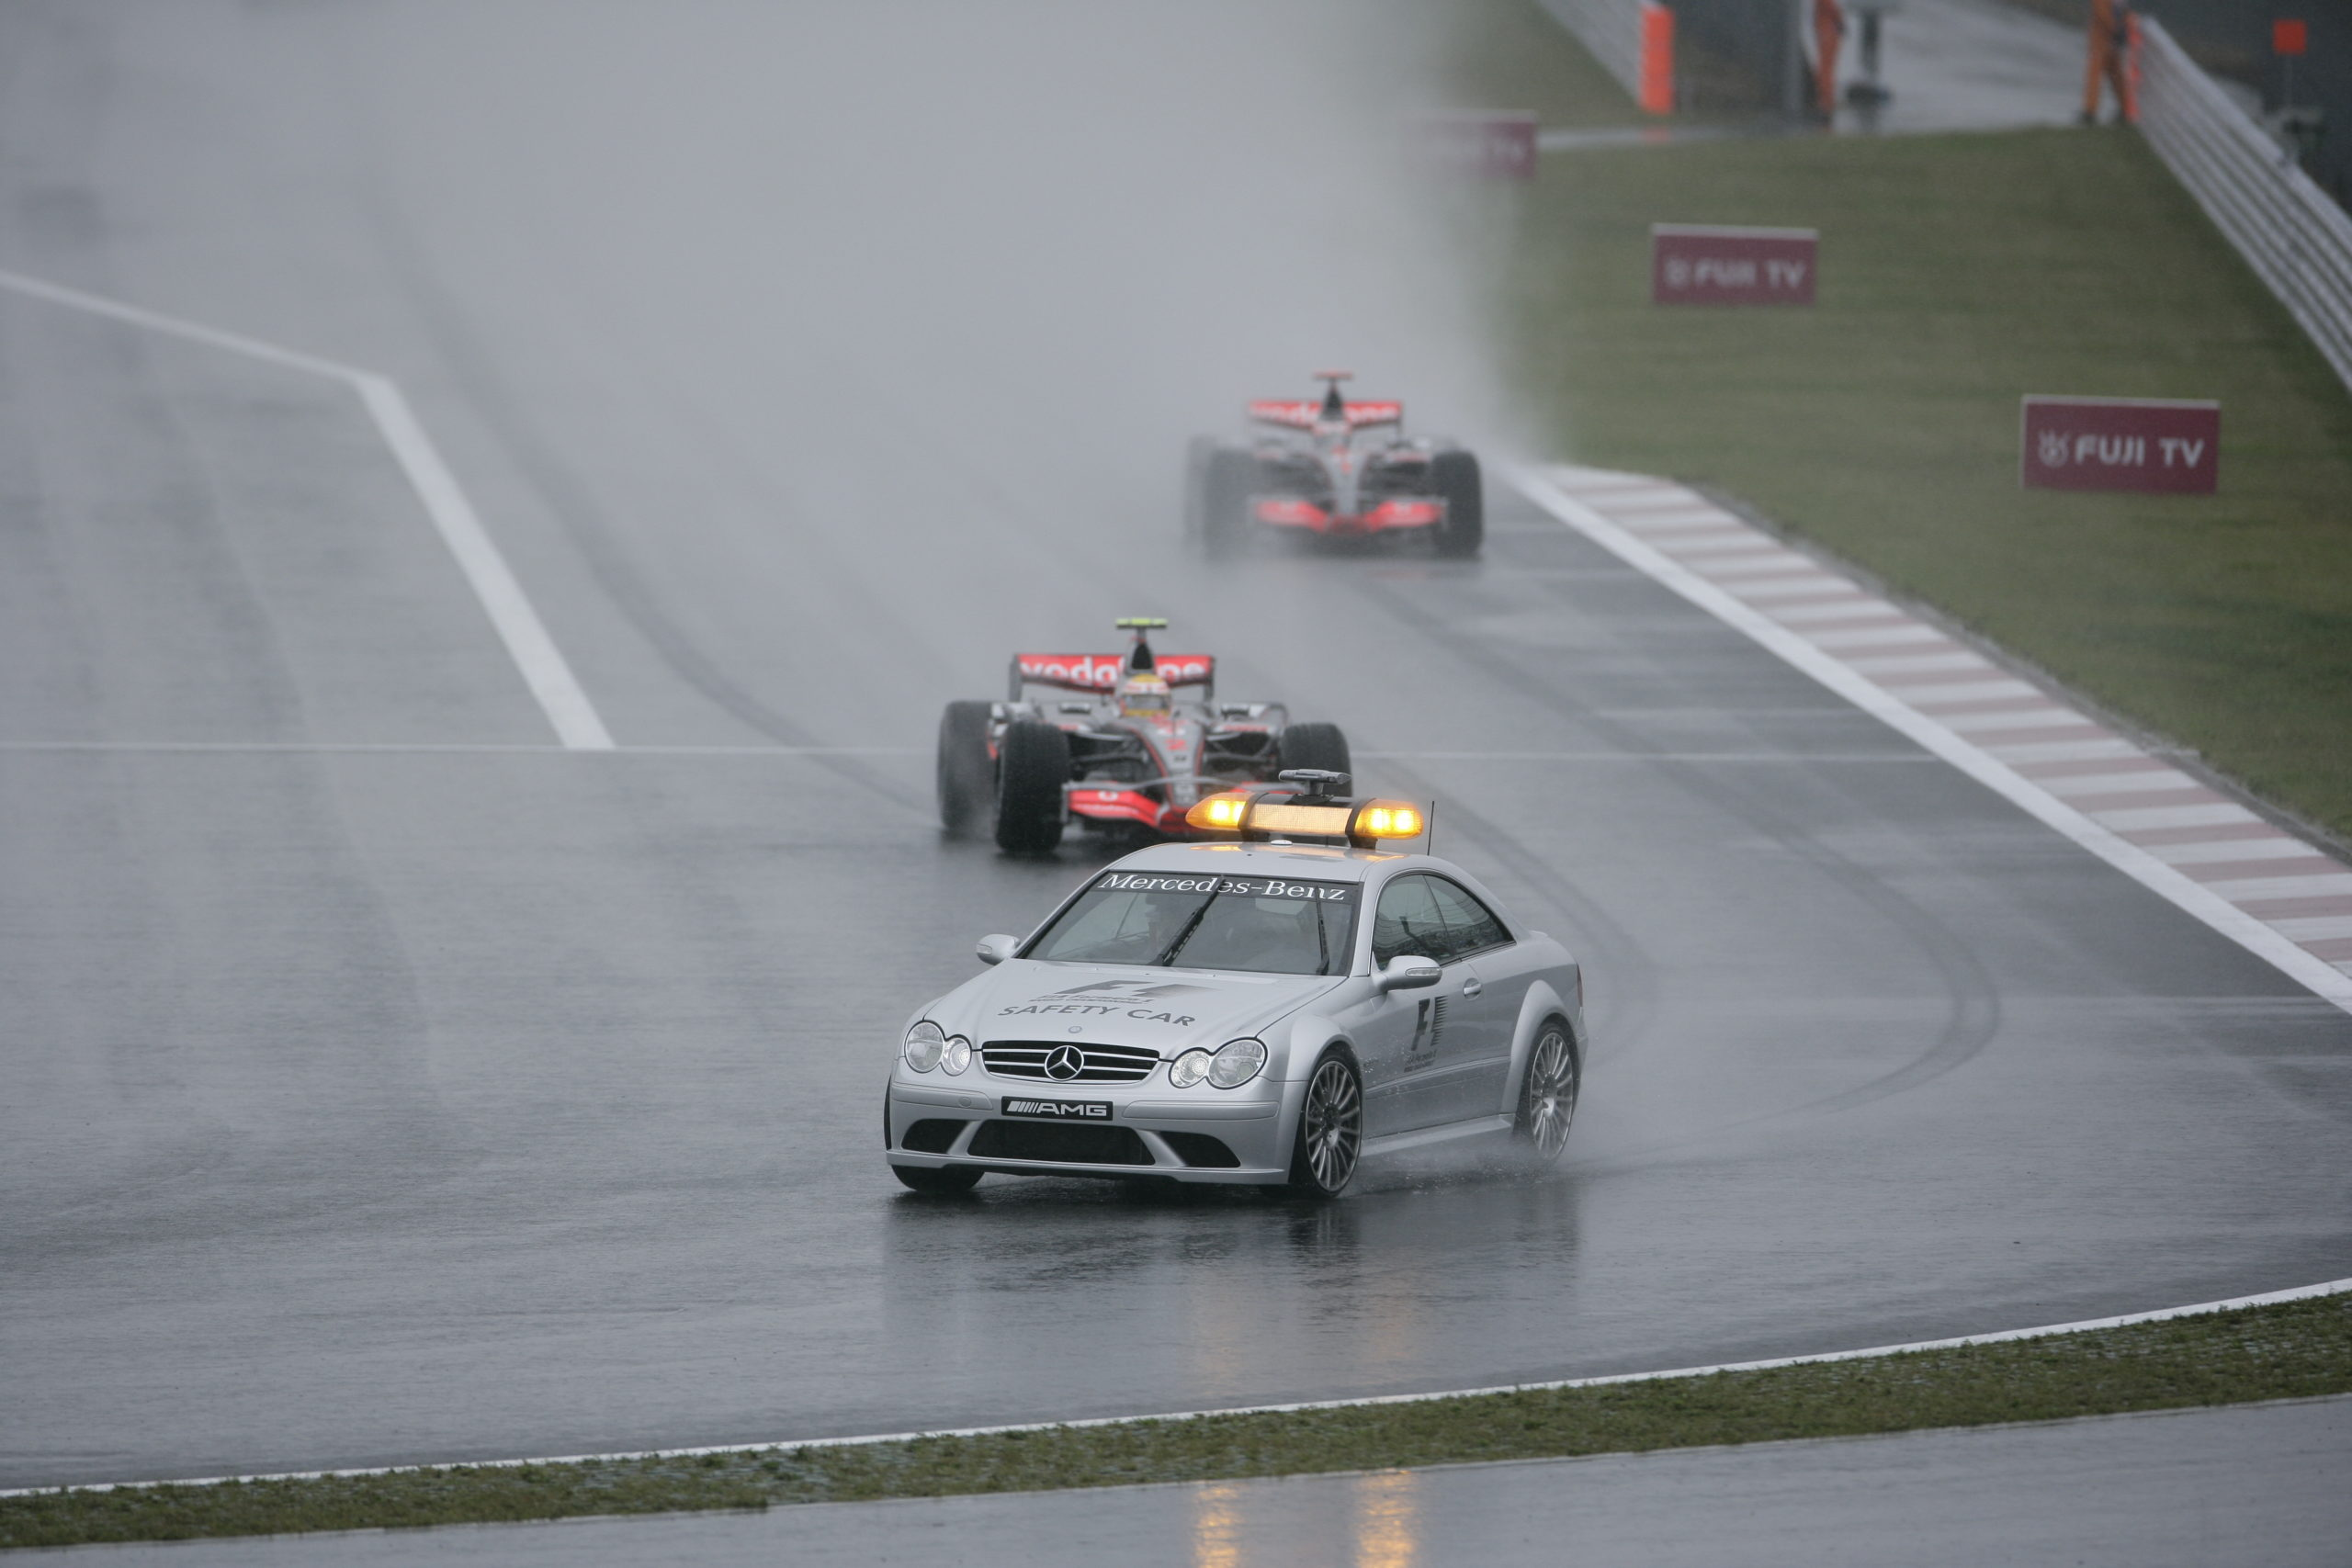 Formel 1, Grand Prix Japan 2007, Fuji, 30.09.2007 F1 Safety Car, Mercedes-Benz CLK 63 AMG Sieger Lewis Hamilton (1.), McLaren-Mercedes MP4-22 Fernando Alonso (Unfall), McLaren-Mercedes MP4-22